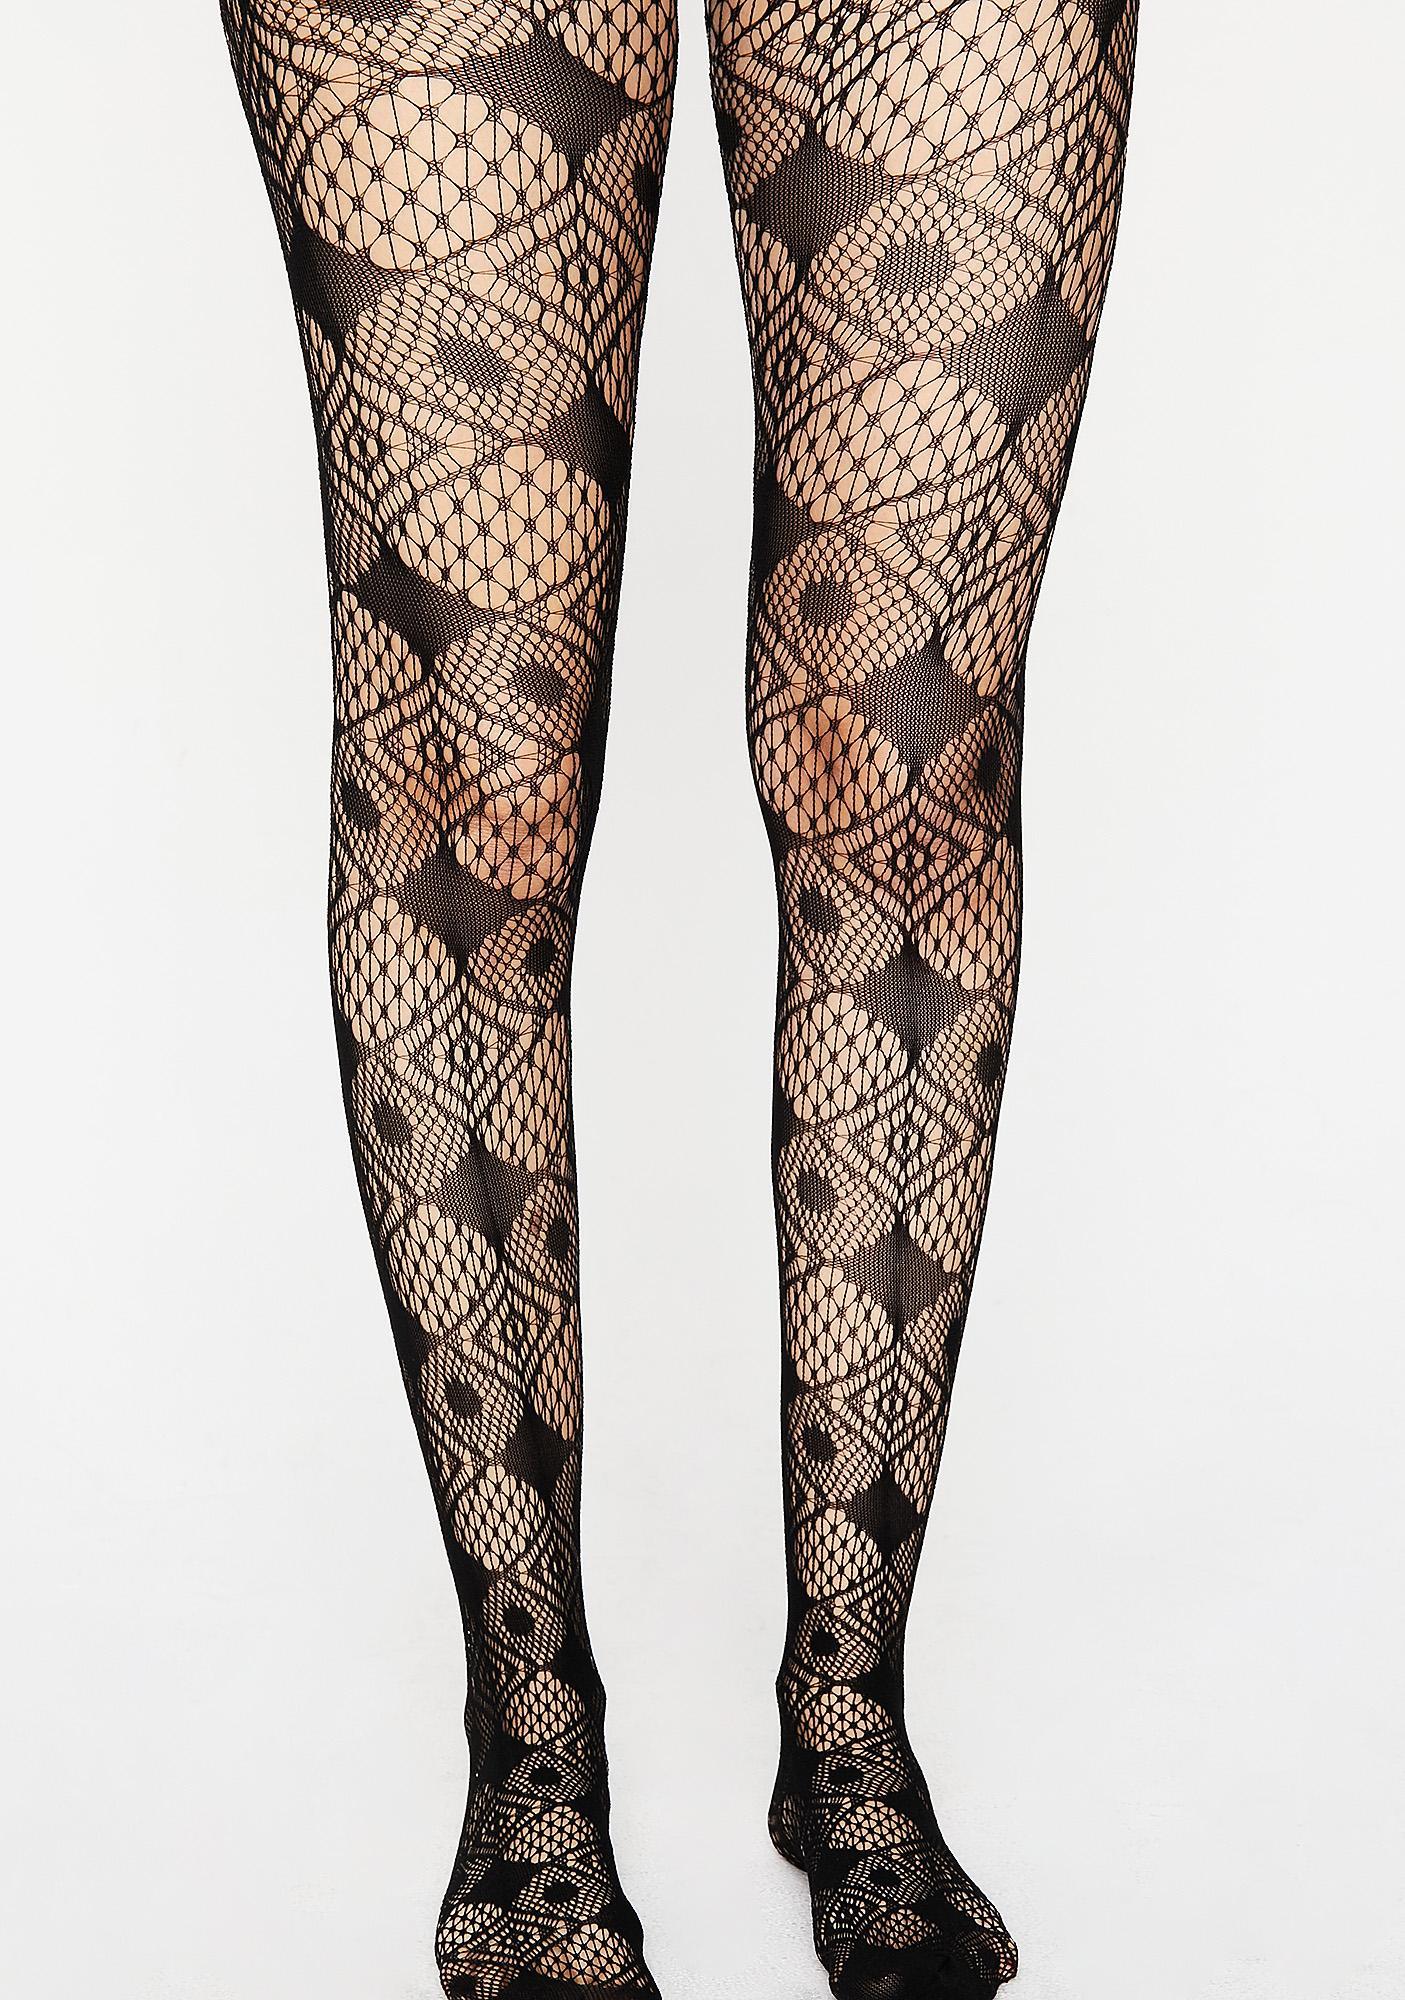 kasuma patterned tights; kasuma patterned tights asvhrkp